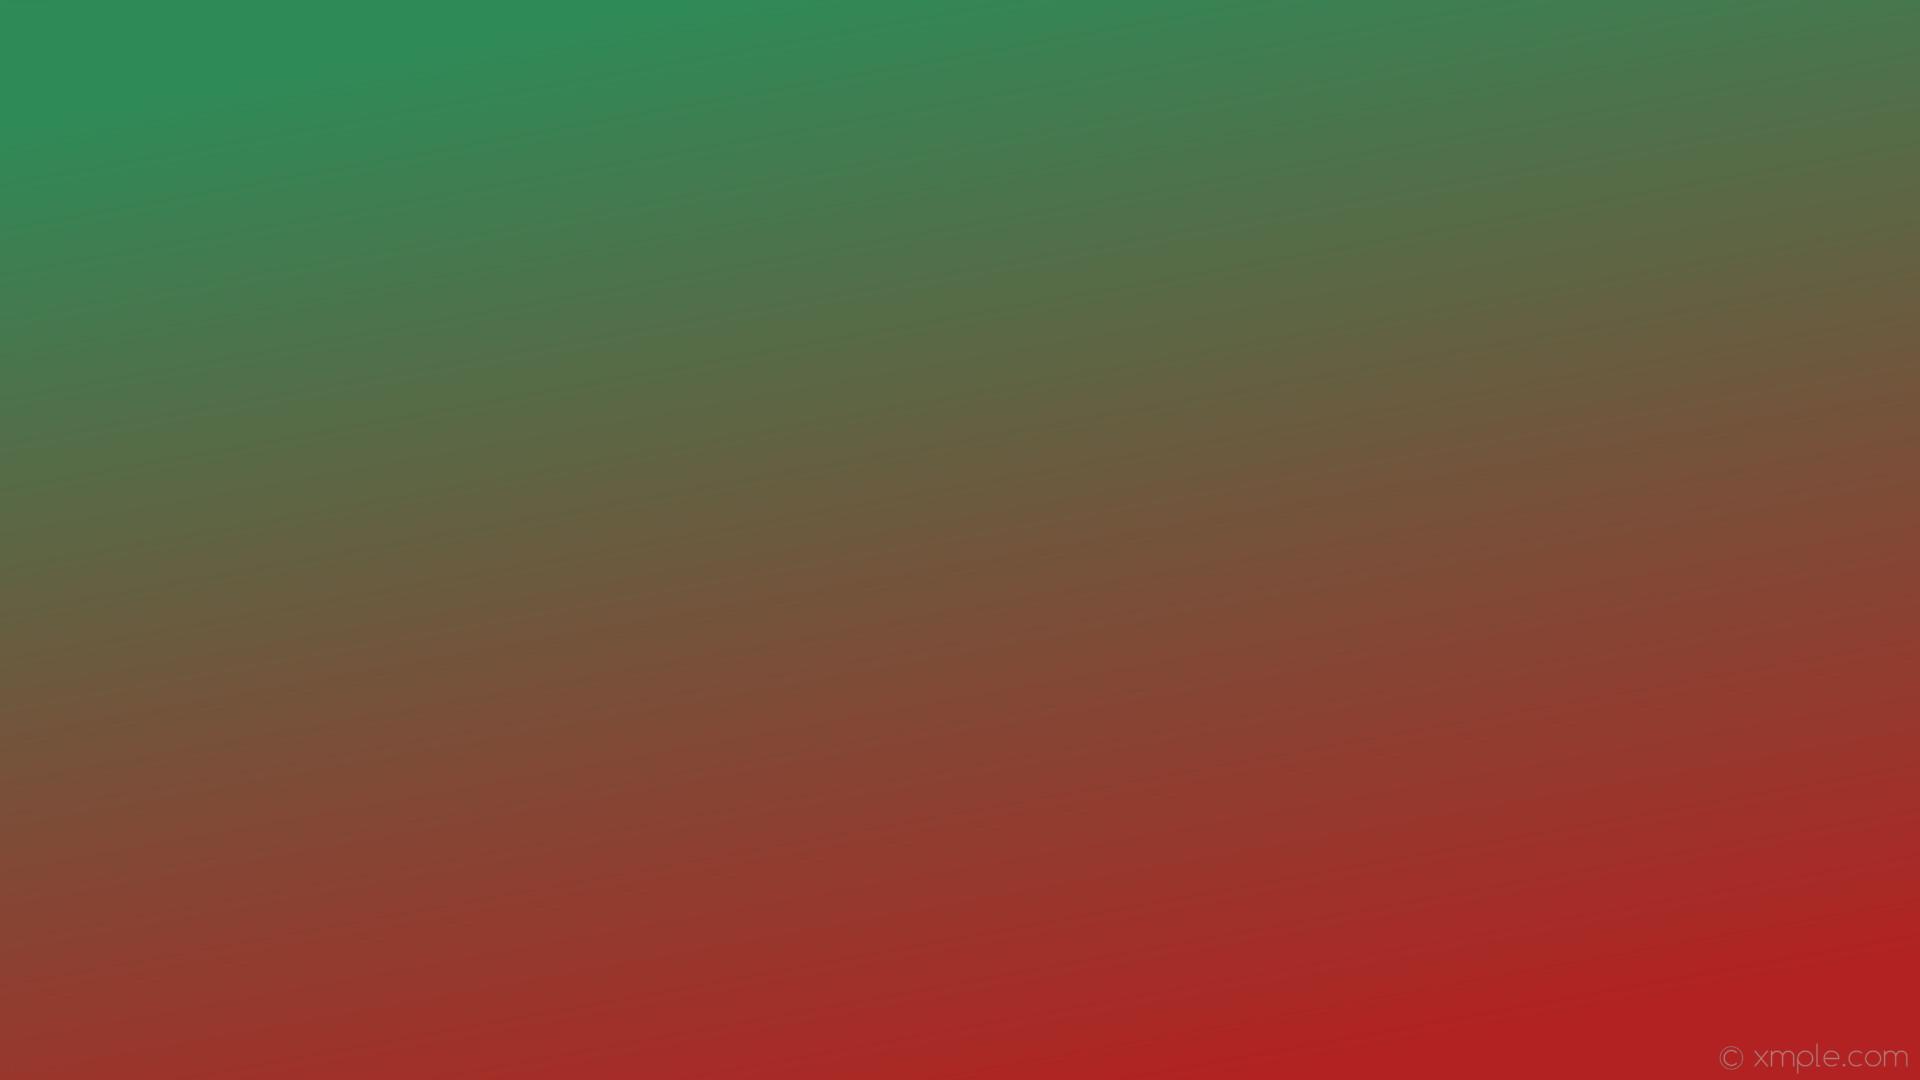 wallpaper red green gradient linear fire brick sea green #b22222 #2e8b57  300°